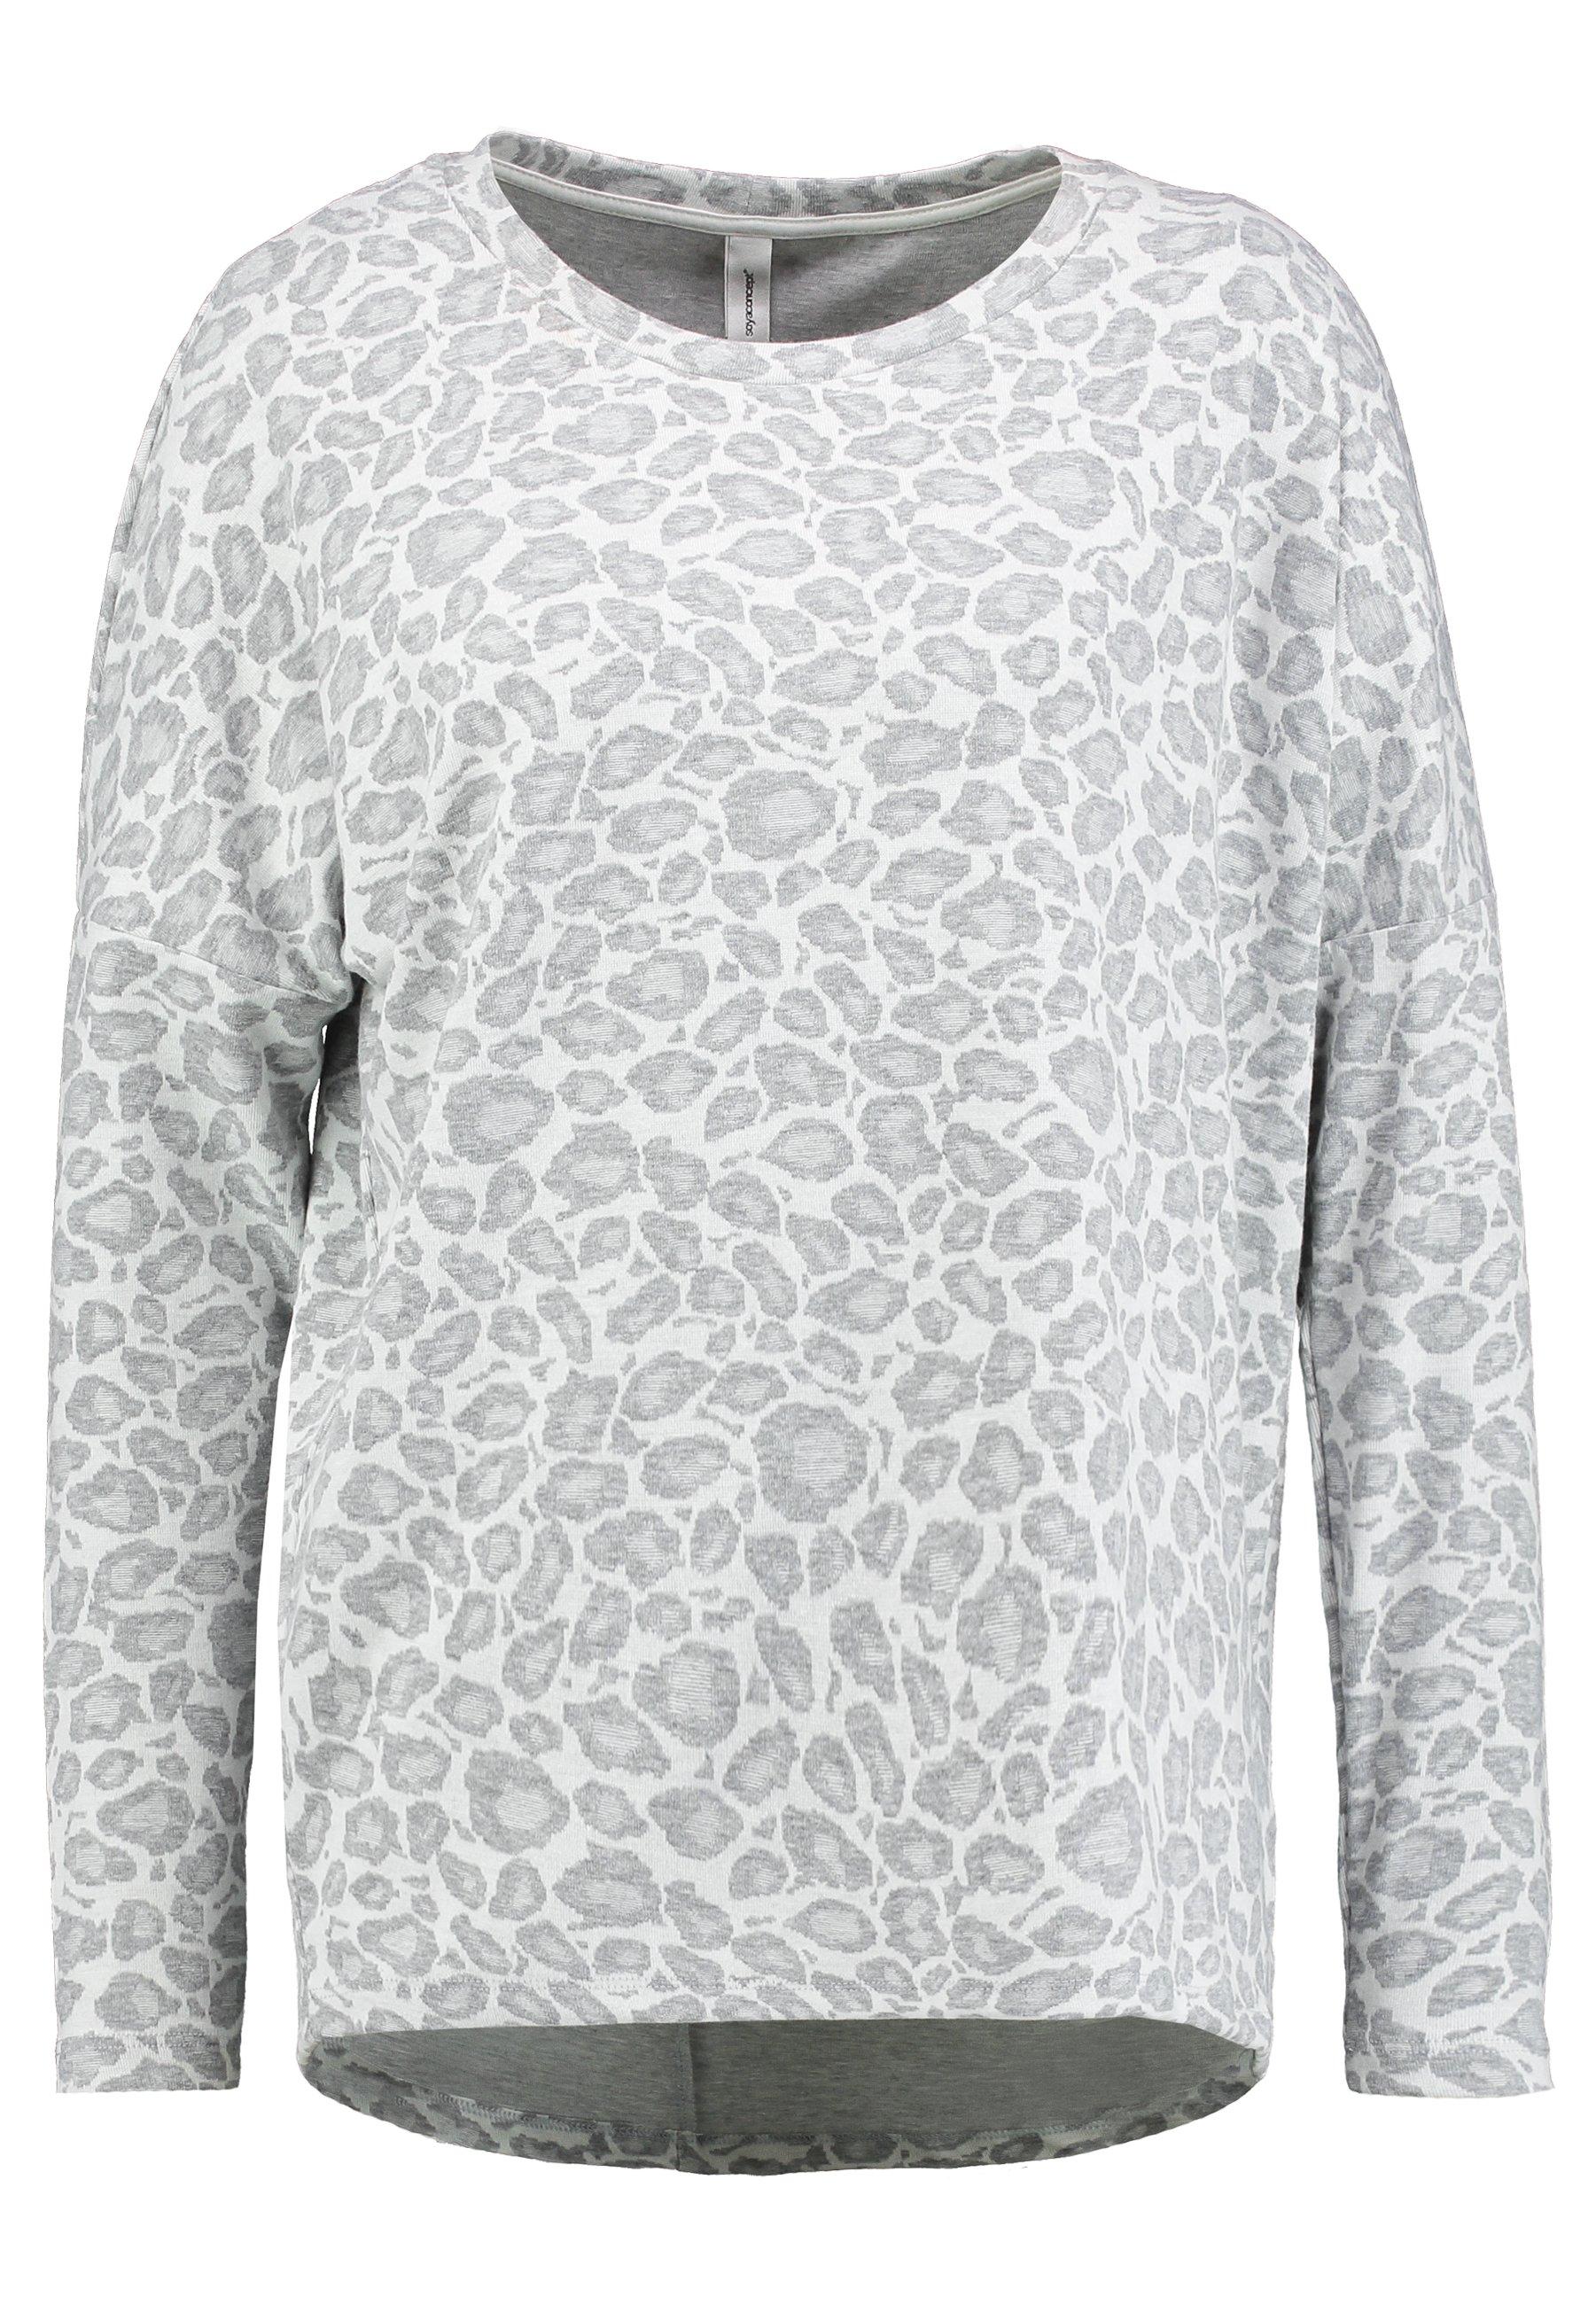 Soyaconcept Enola - Long Sleeved Top Grey Melange Combi